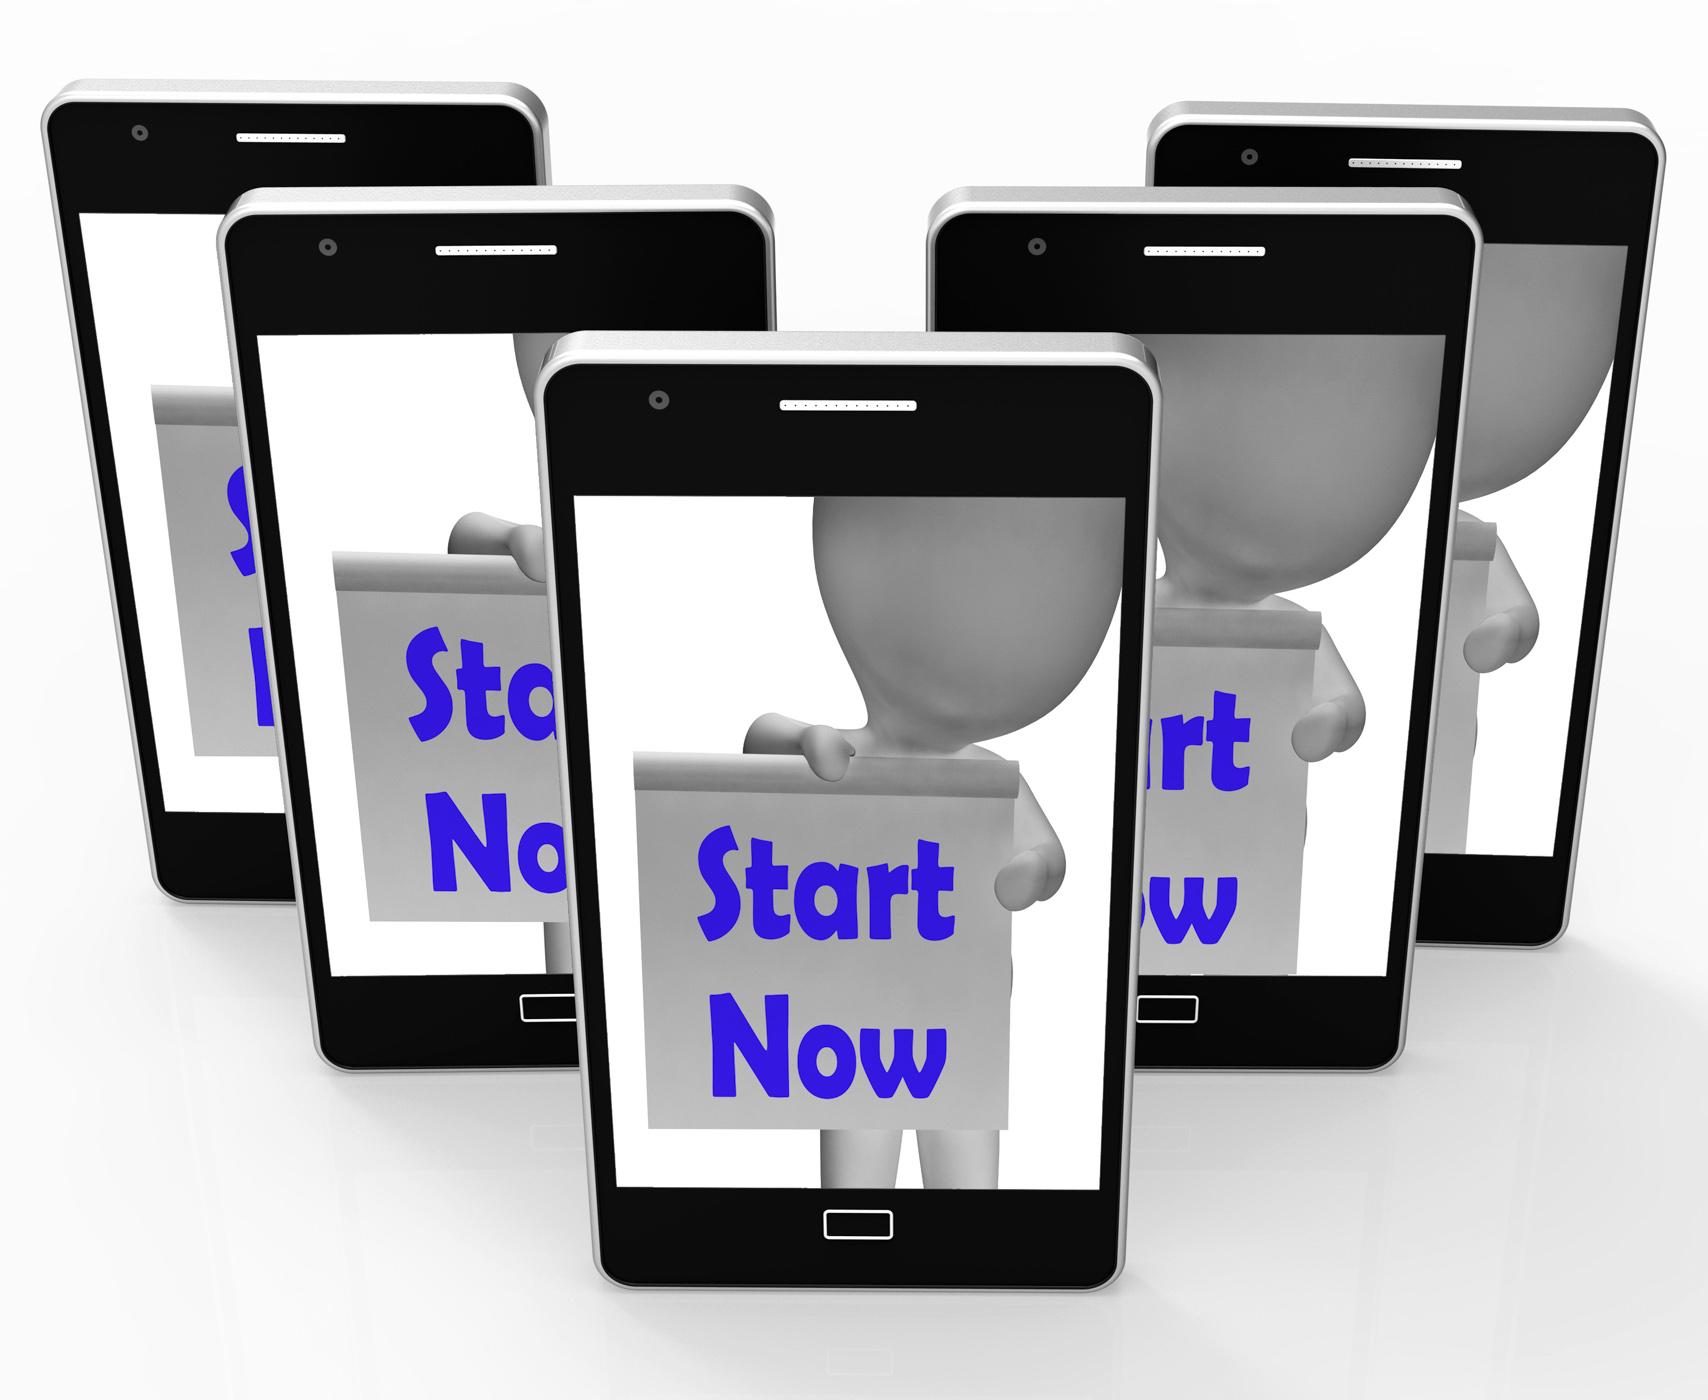 Start now phone shows begin or do immediately photo